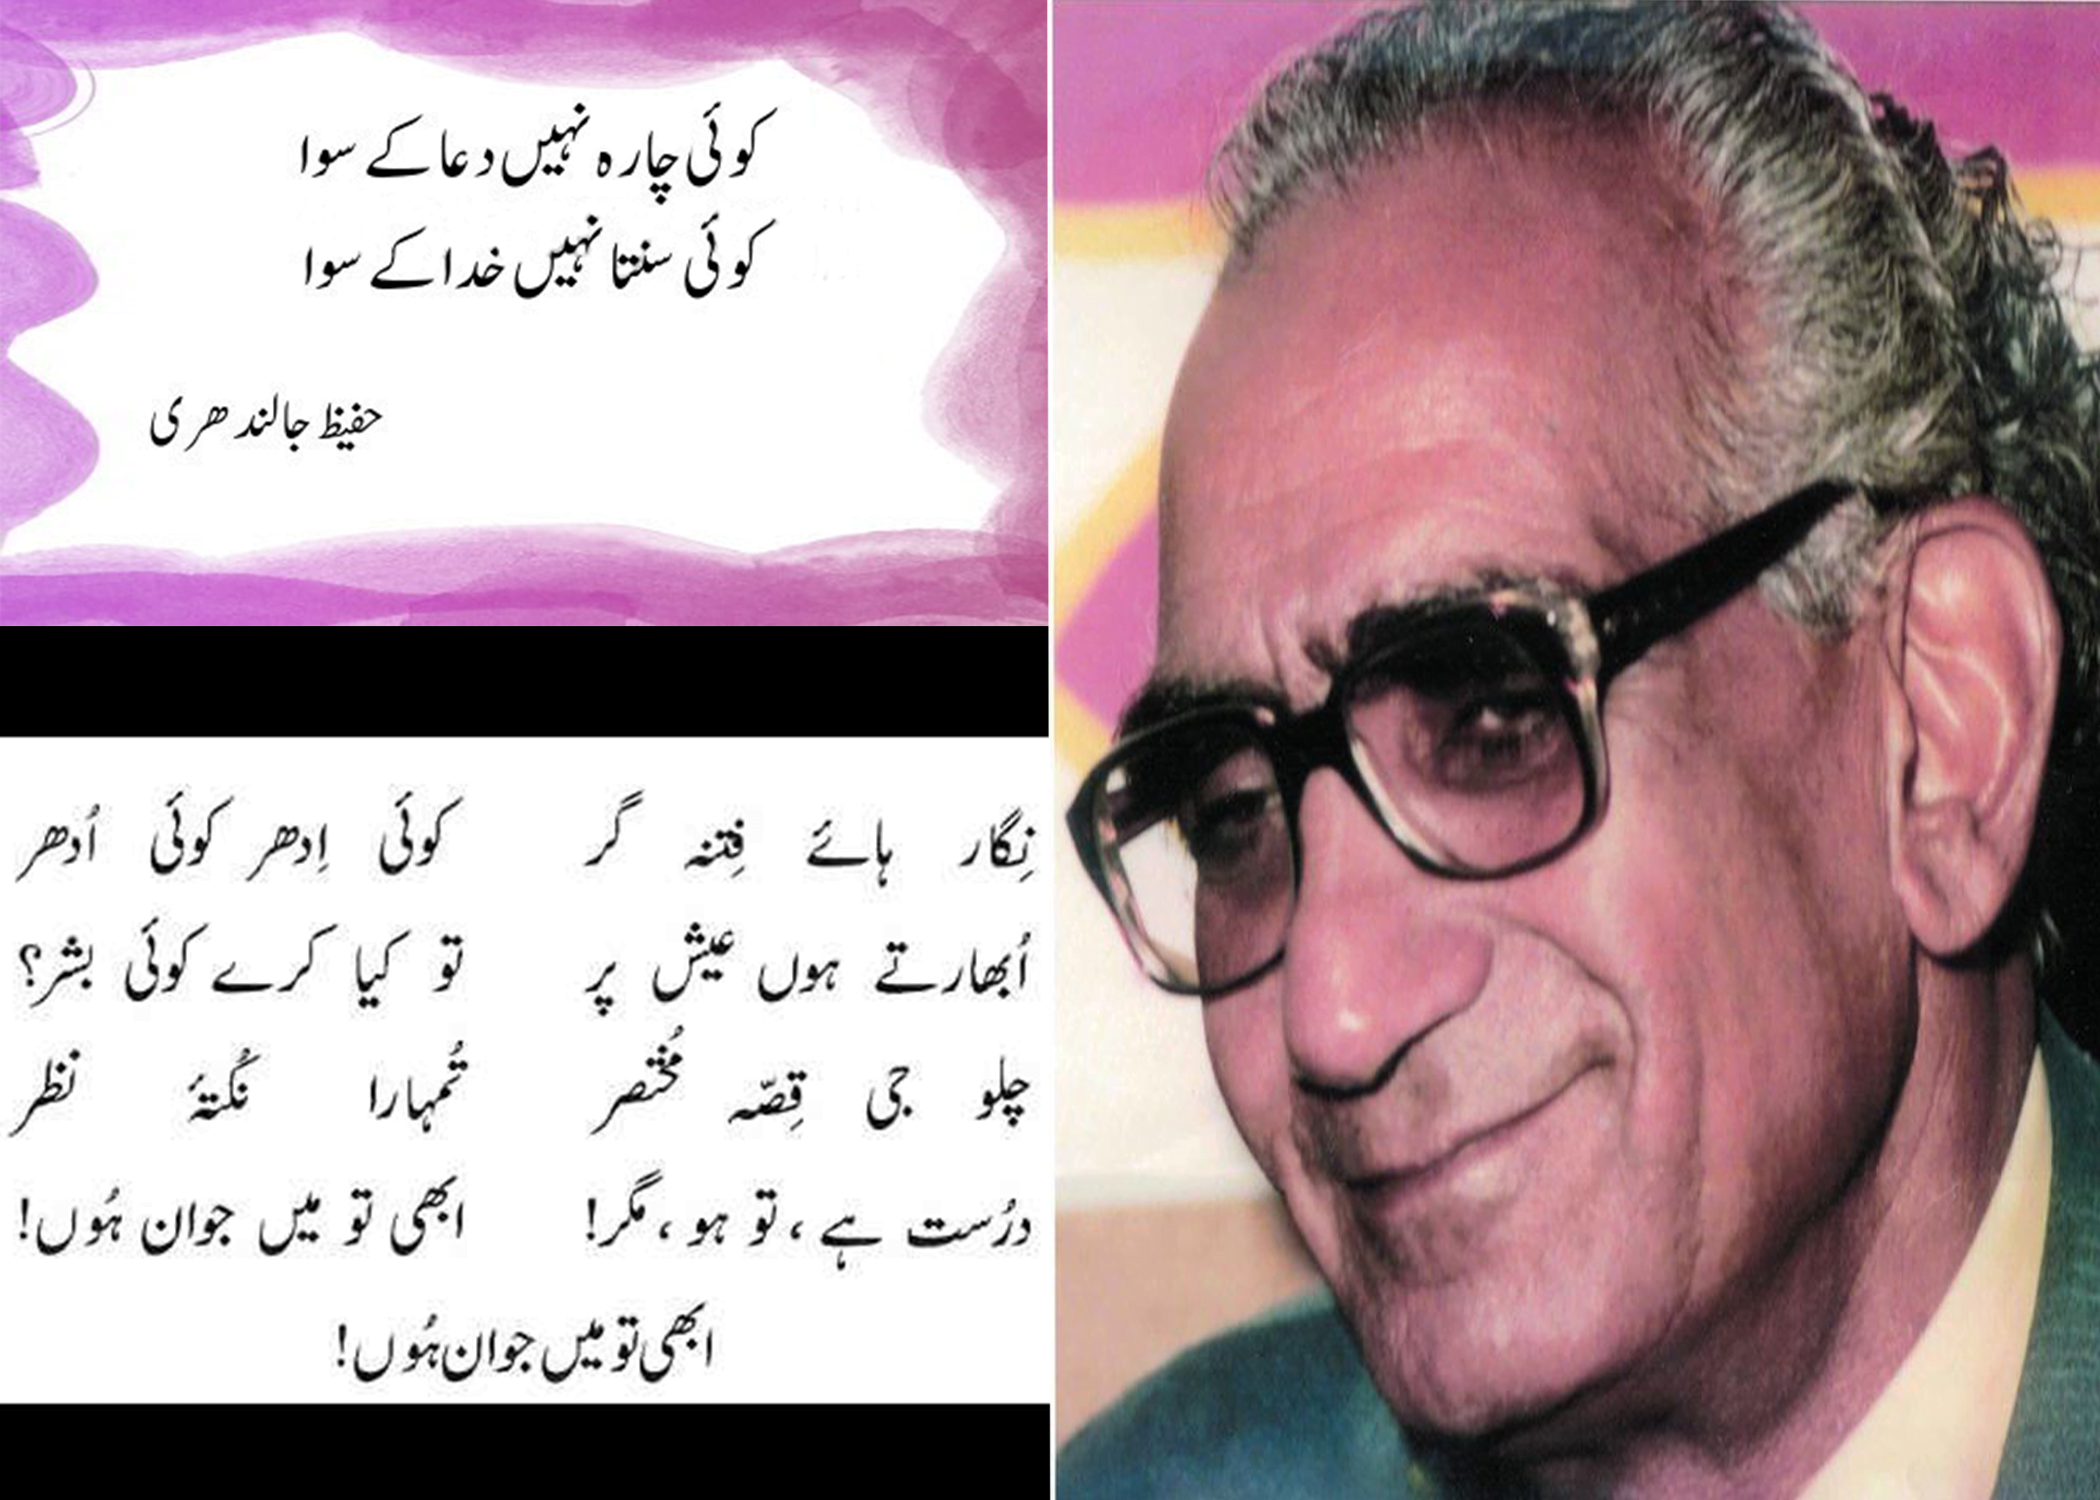 Hafeez Jalandhari and his poetry